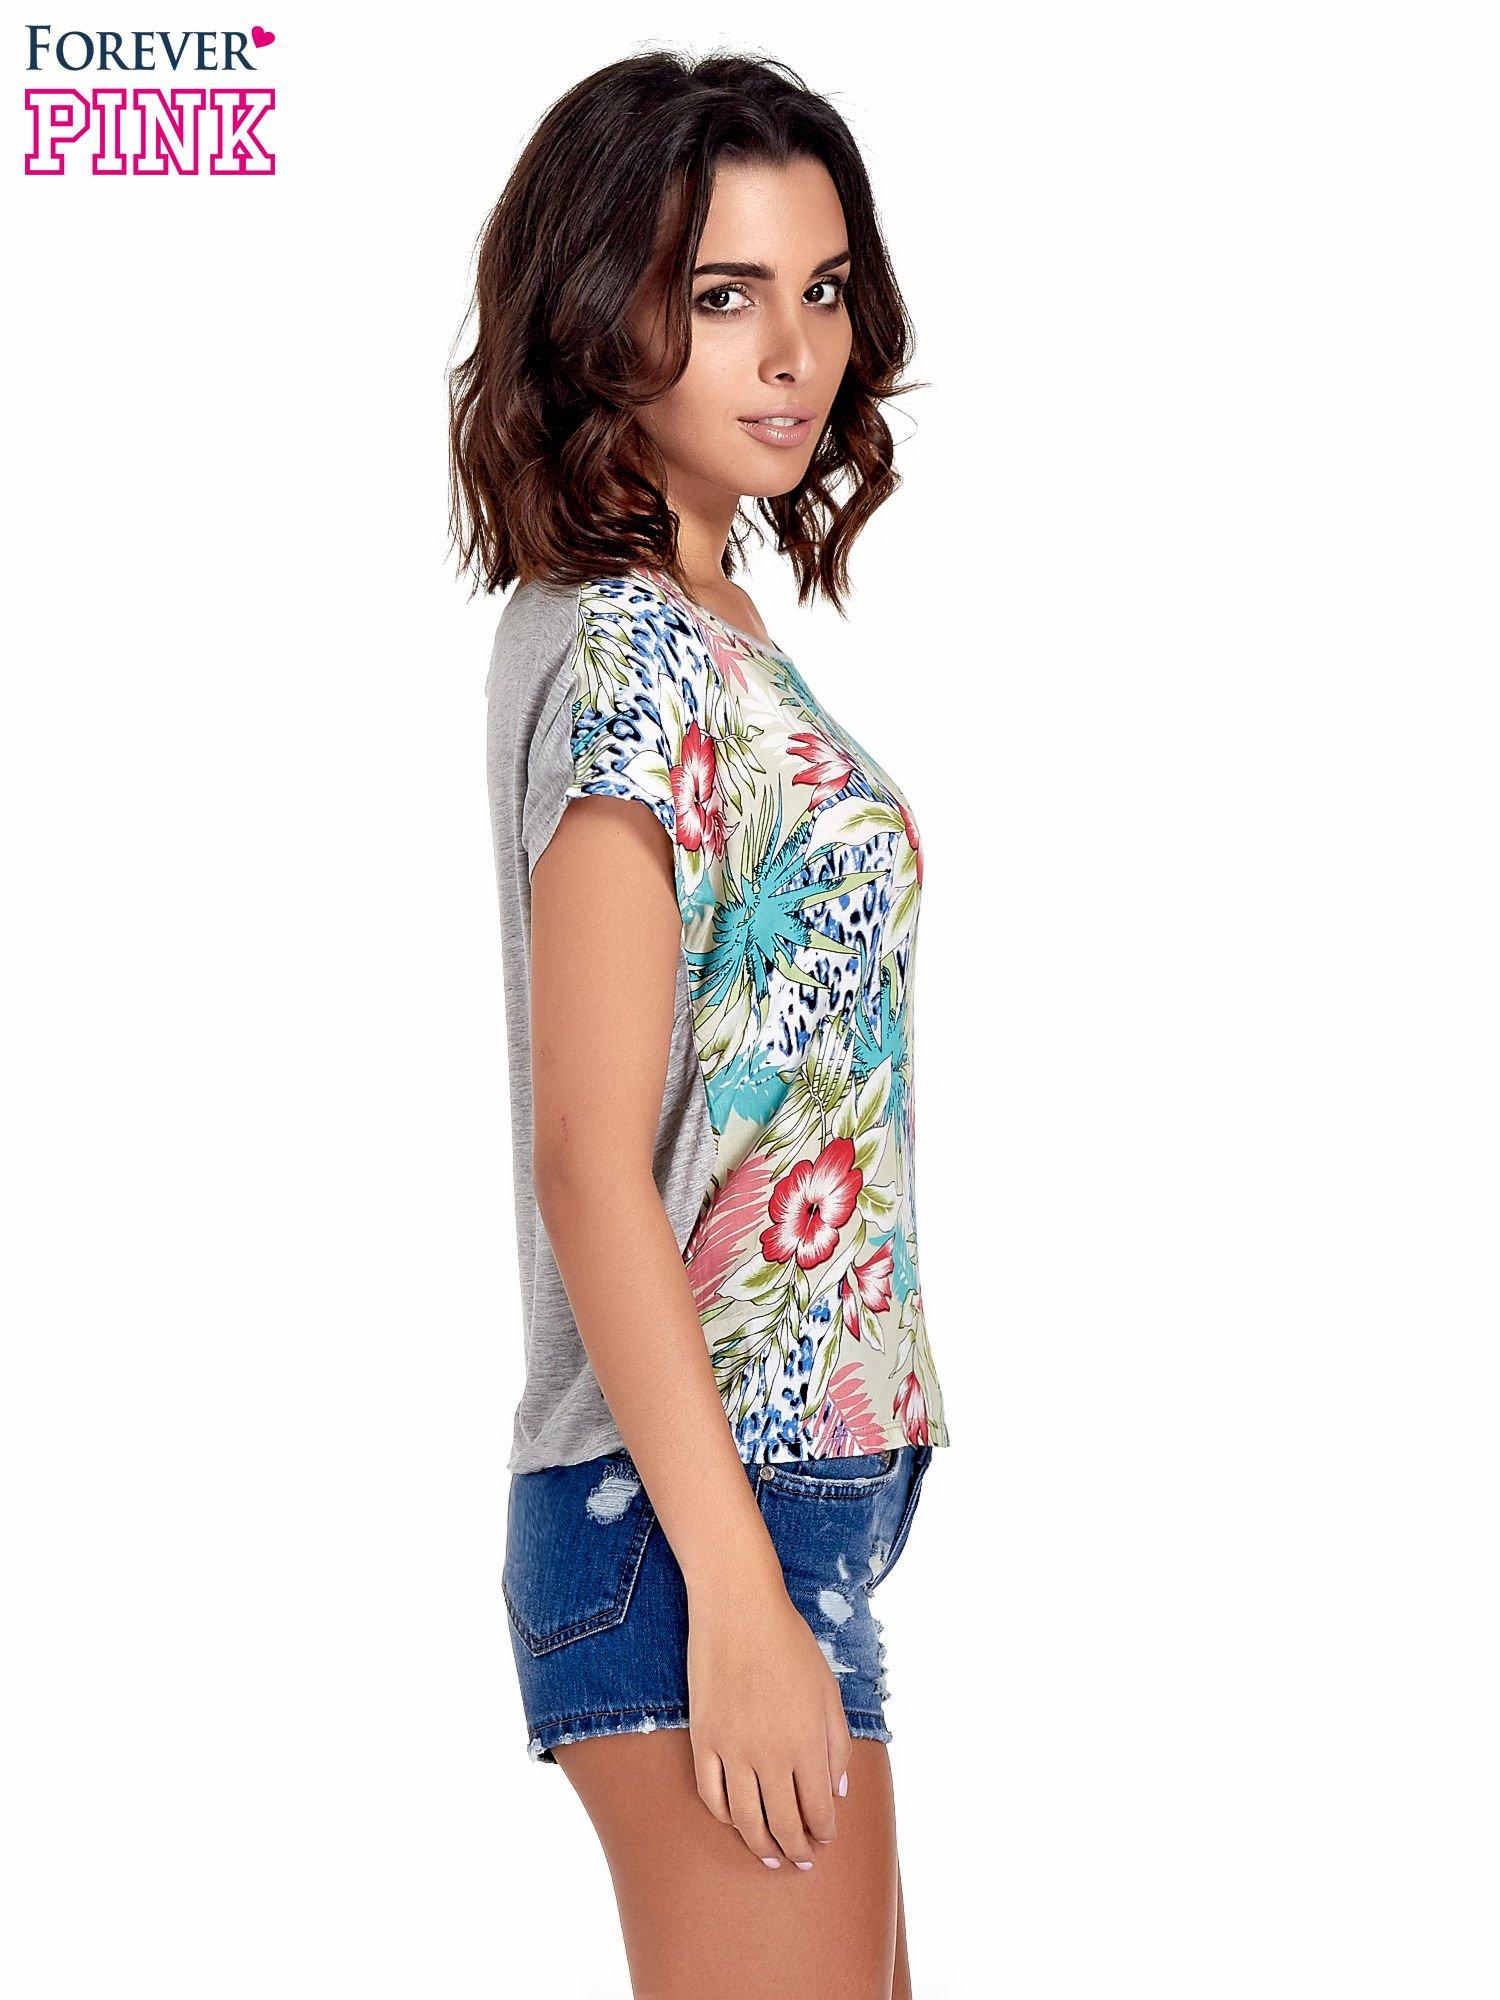 Szary t-shirt z nadrukiem floral print                                  zdj.                                  3